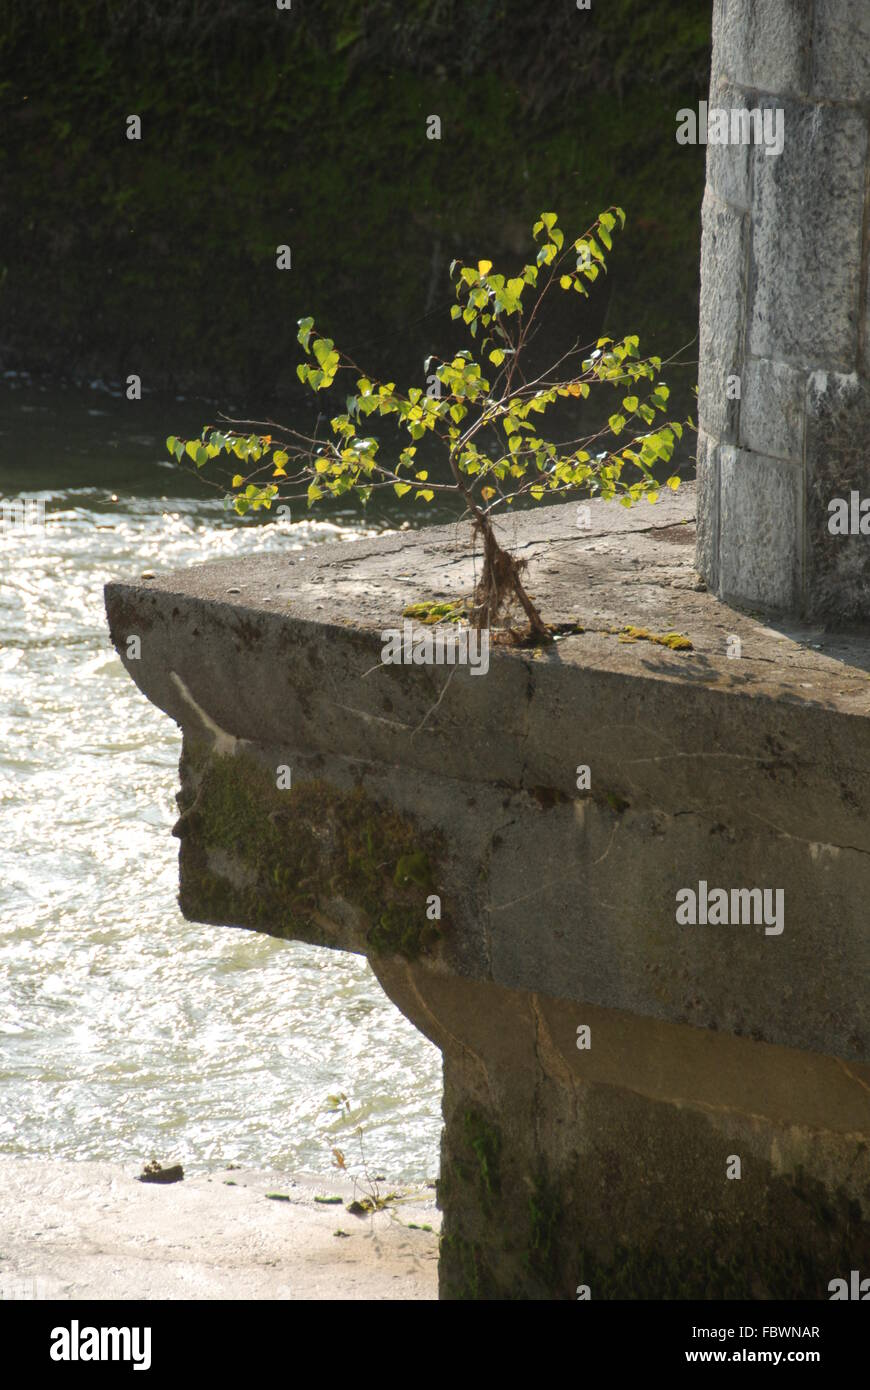 Tough tree - Stock Image